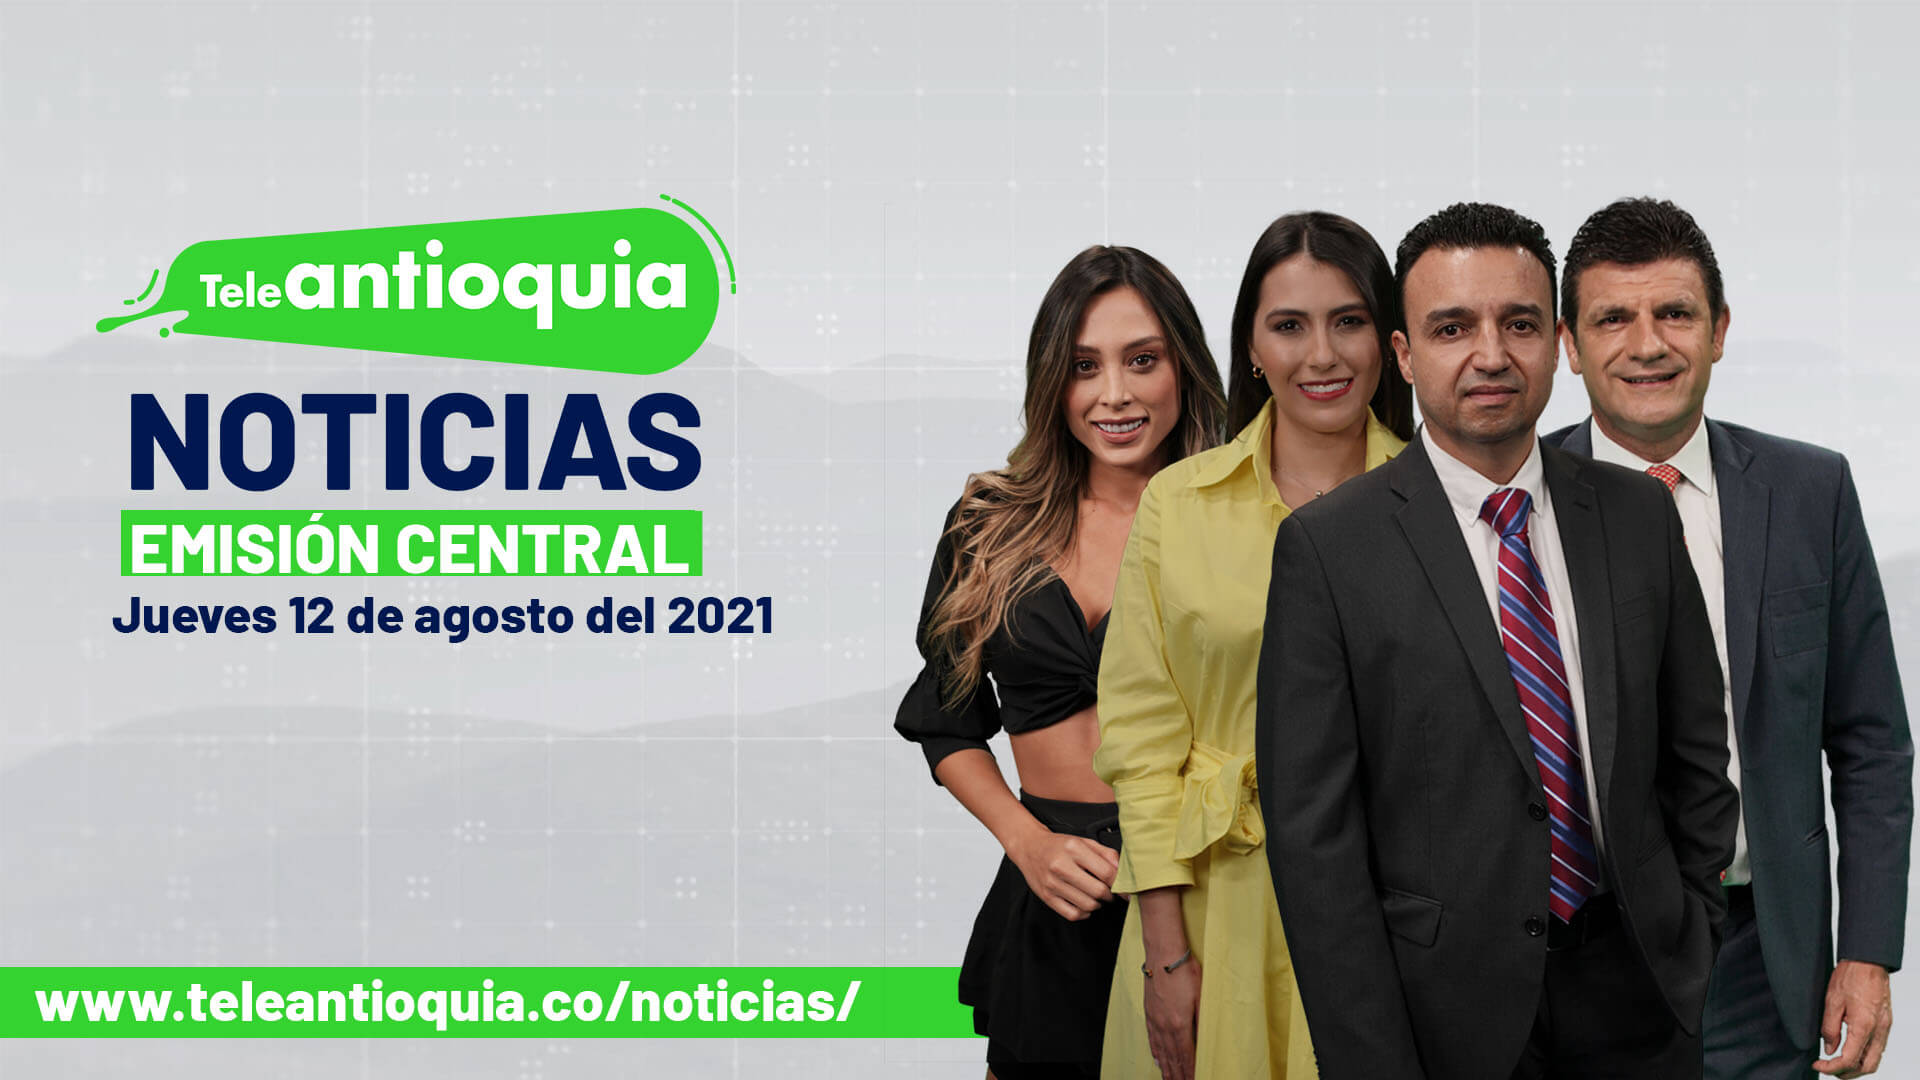 Valle de Aburrá, Antioquia, Región, Teleantioquia Noticias, Medellín, Colombia, Teleantioquia,